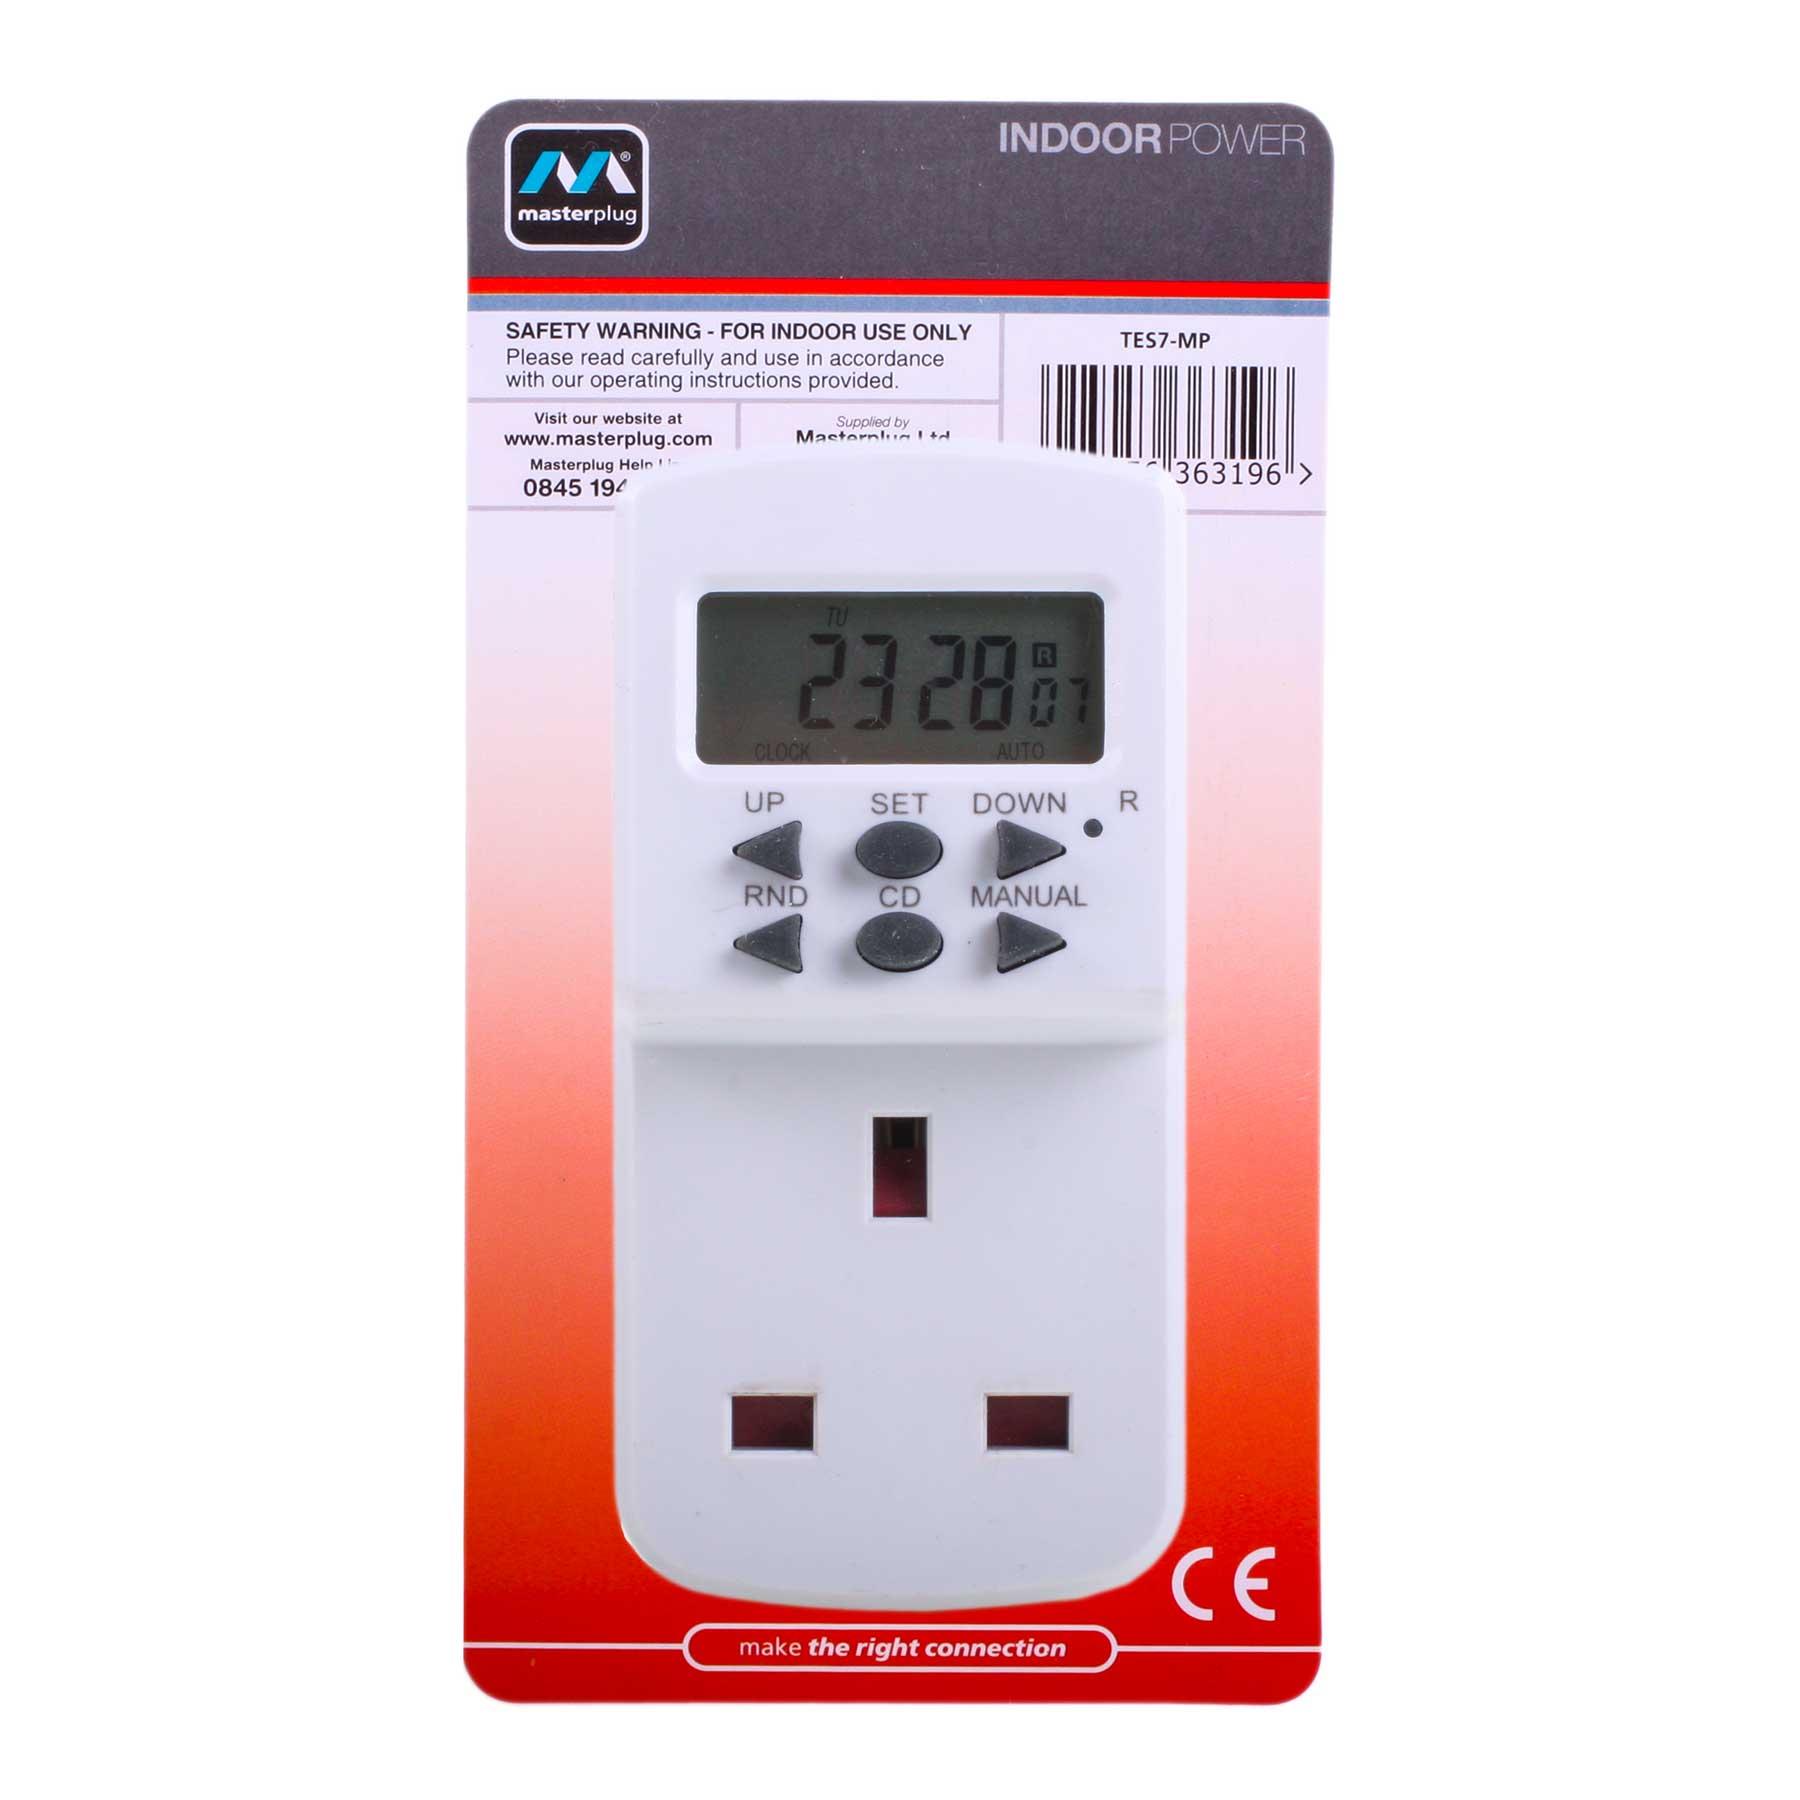 Masterplug Te7 Mp 7 Day Plug In Digital Timer Switch